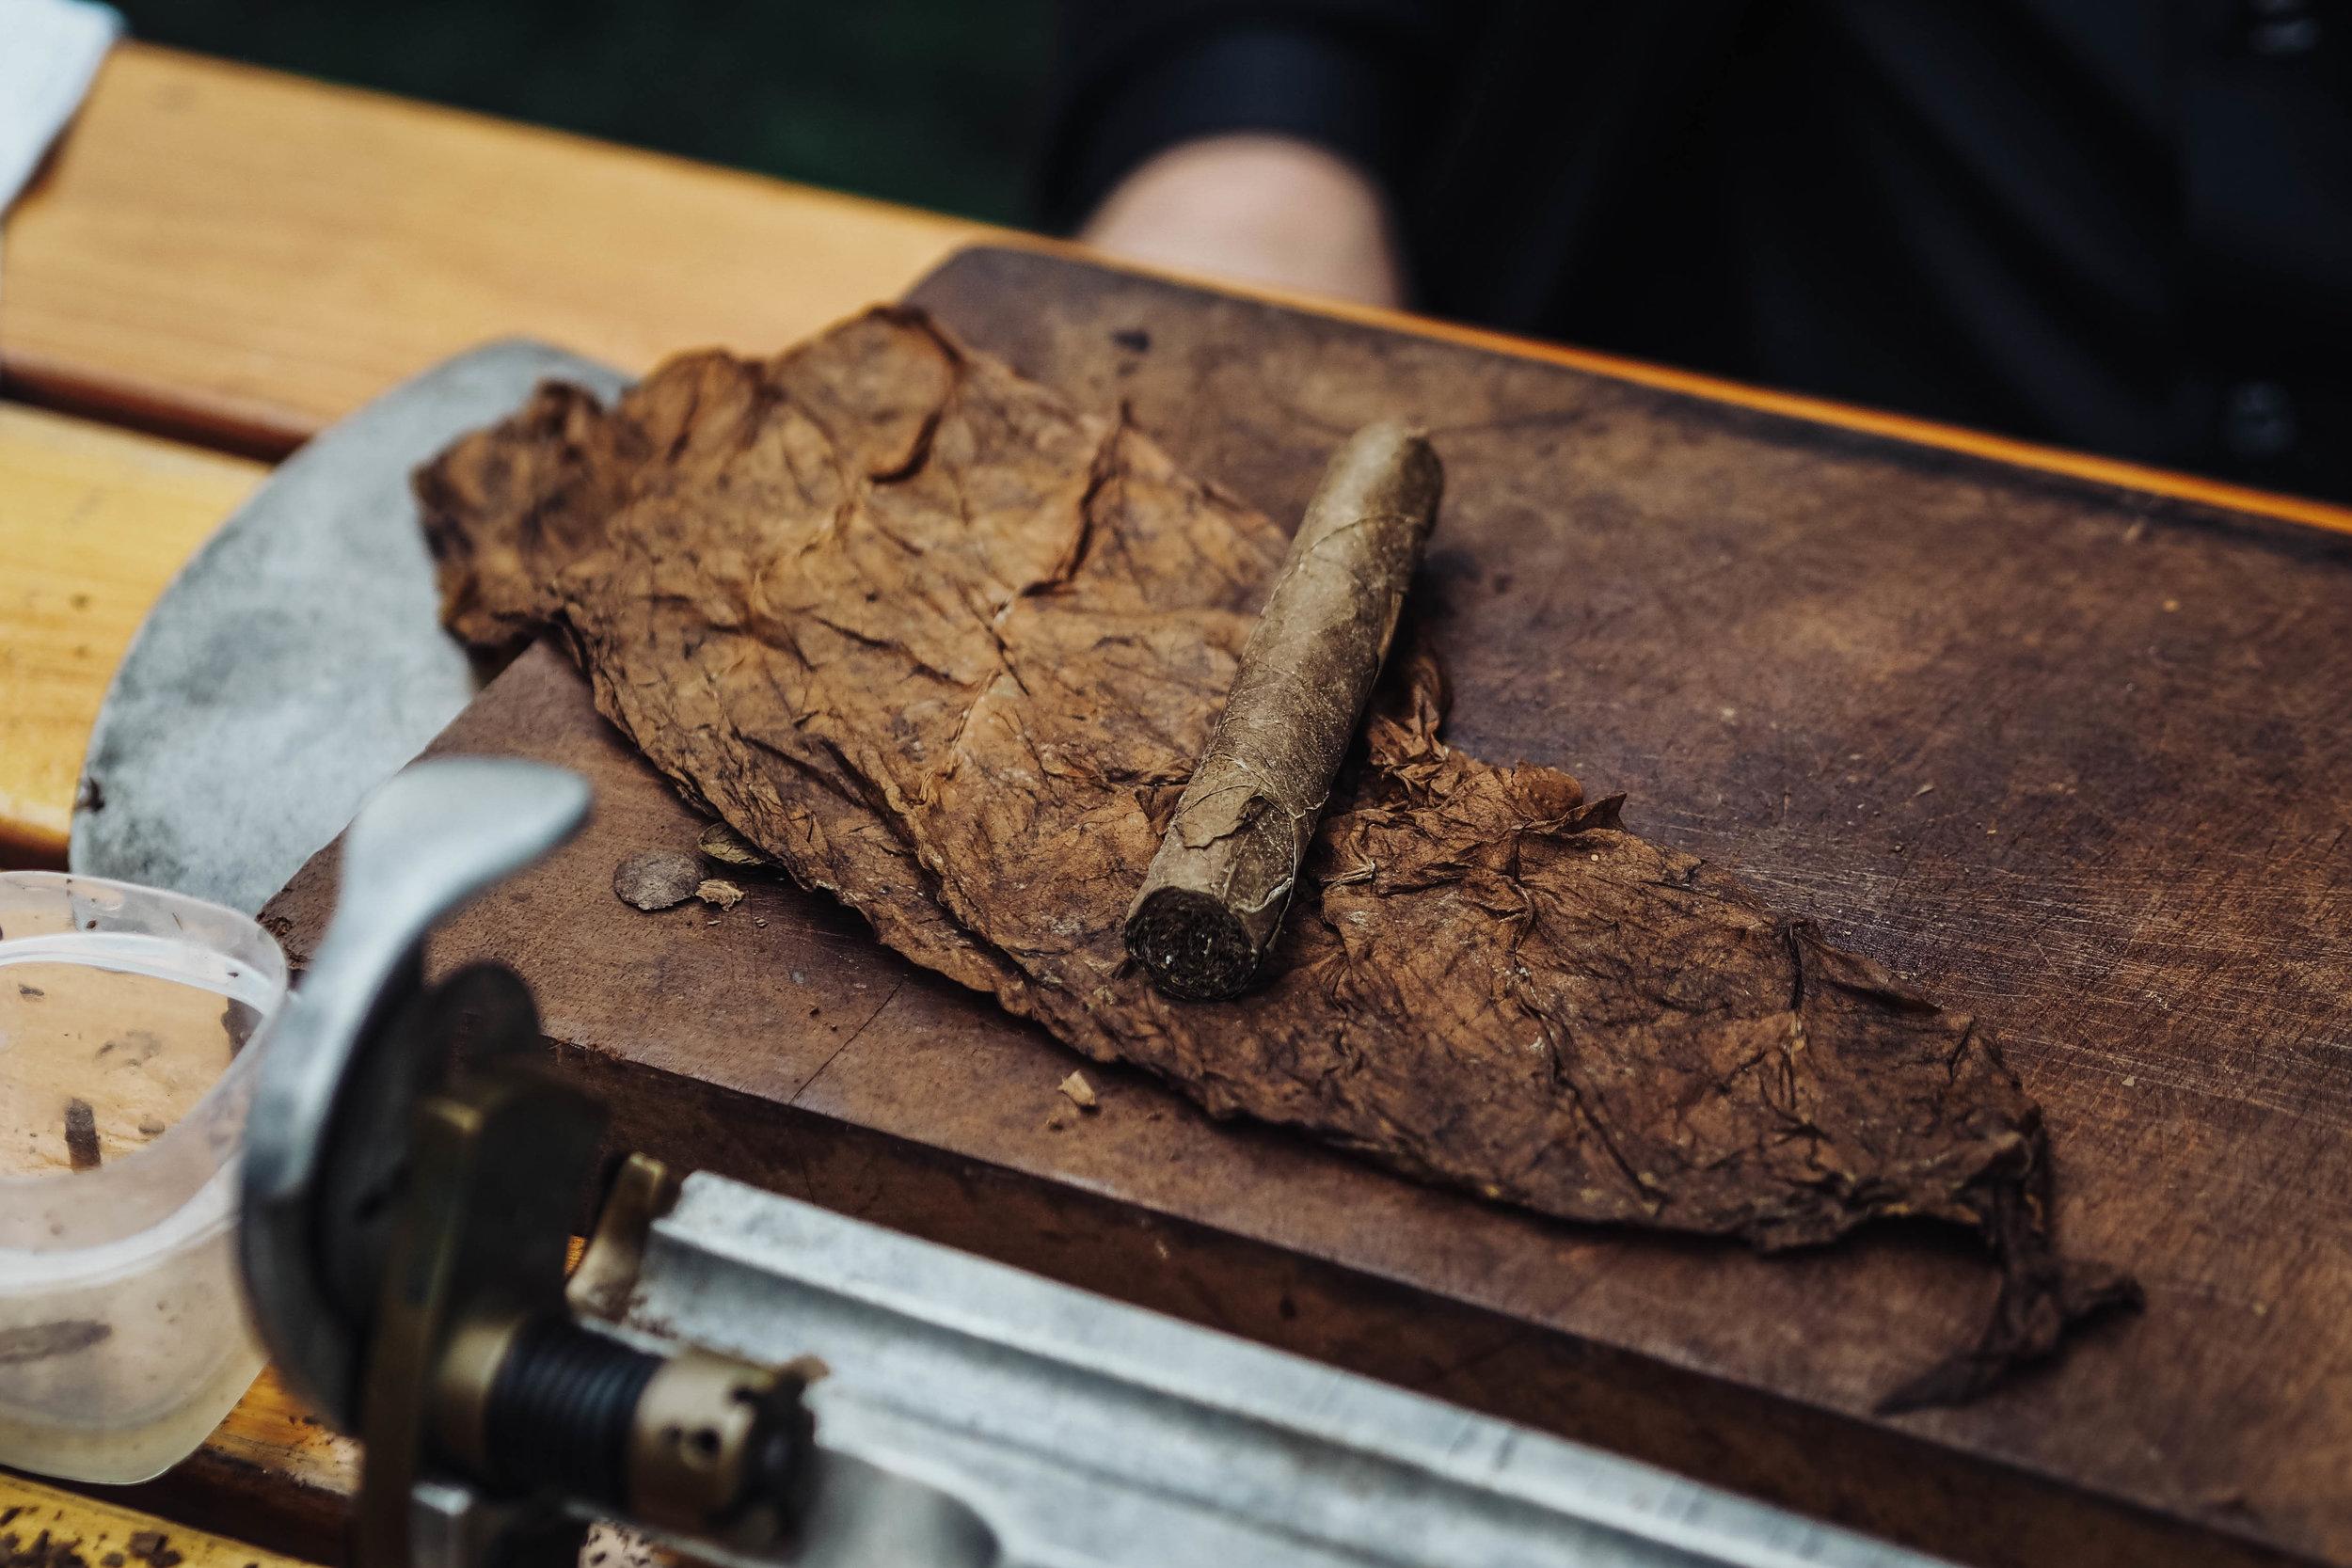 Cigar tobacco leaves.